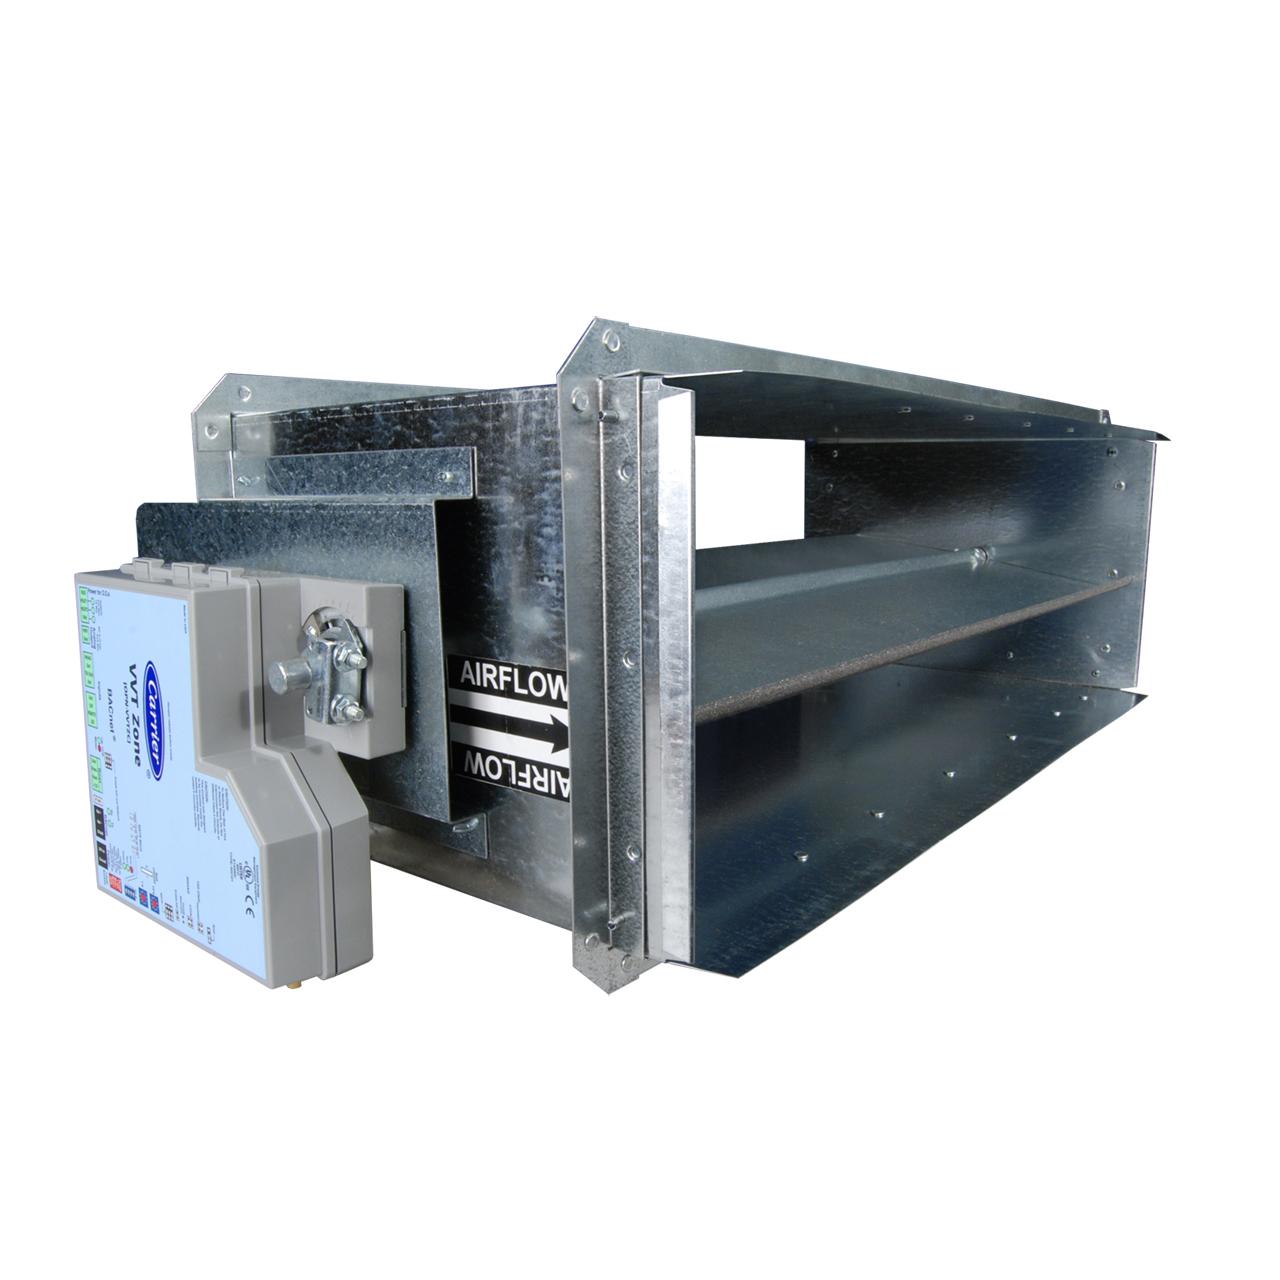 carrier-OPND-rectangular-damper-with-vvt-zone-controller